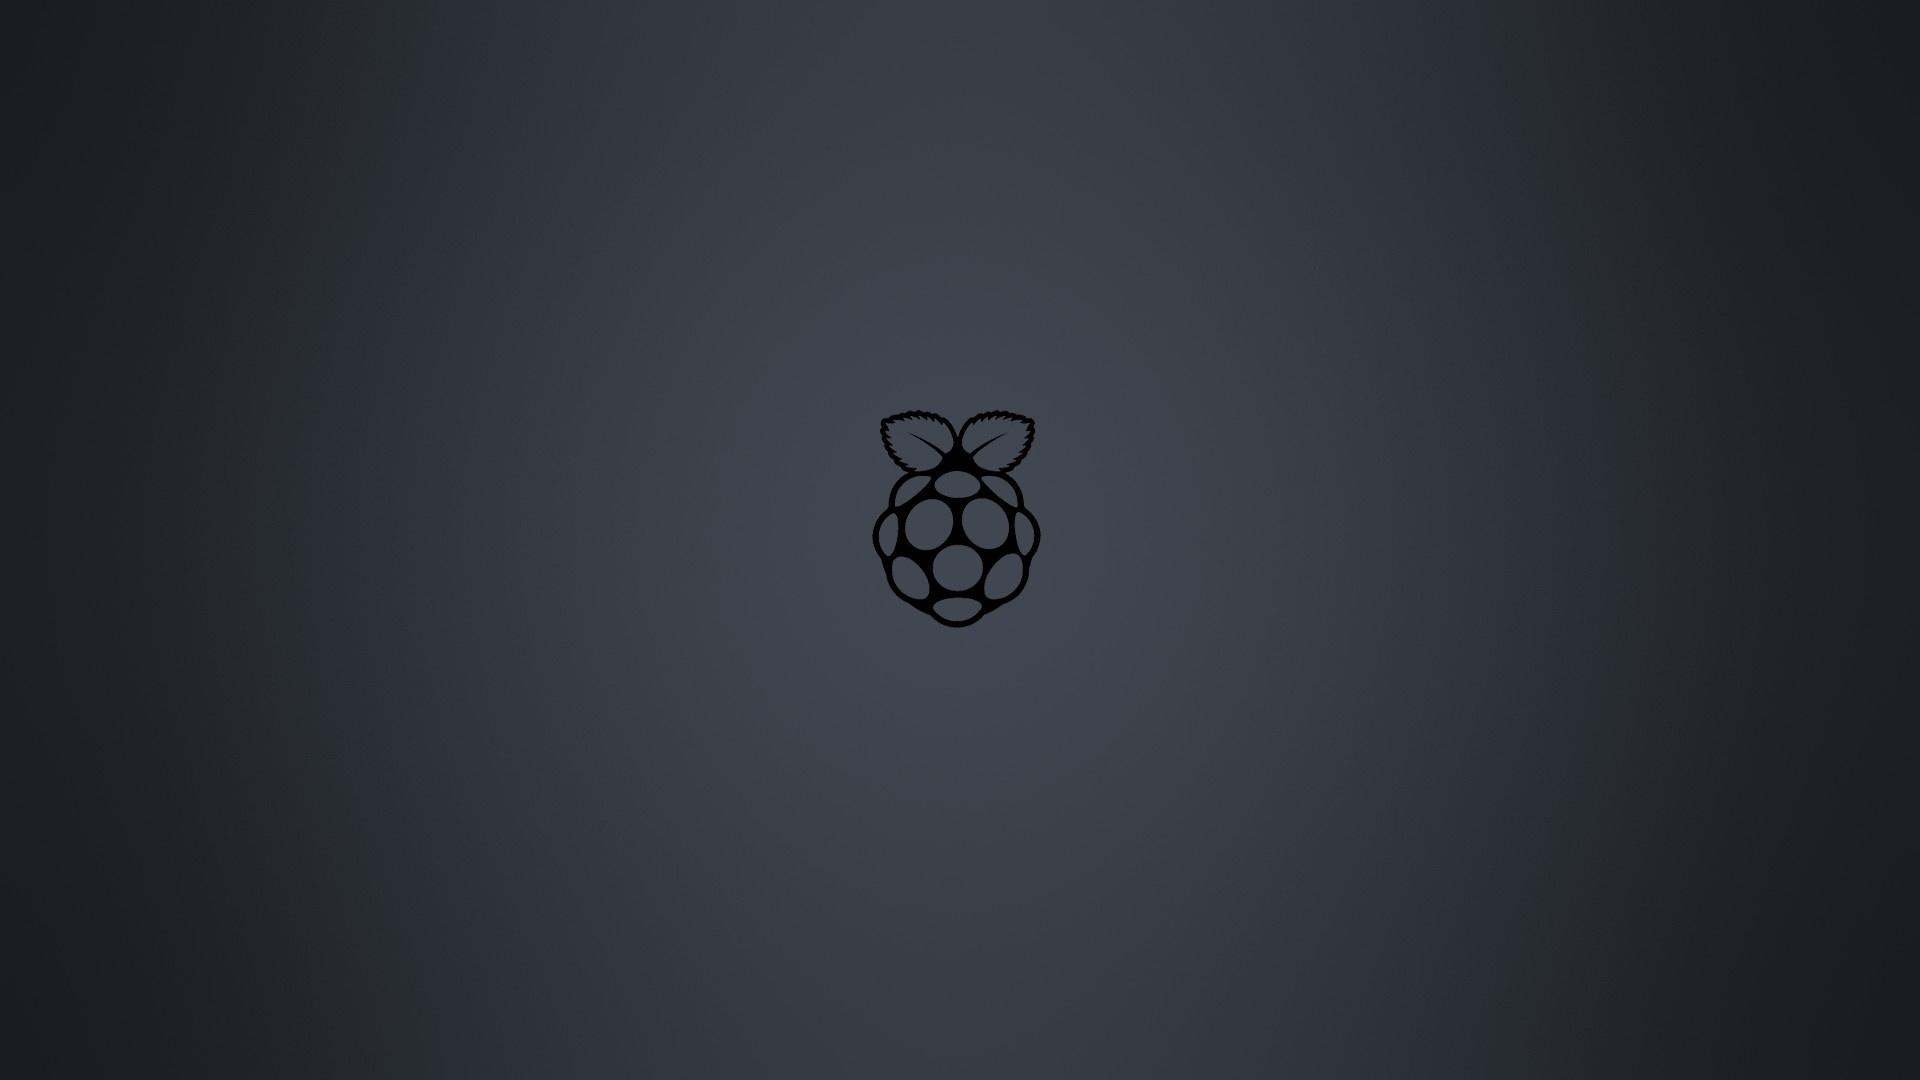 Programming Minimalist Image